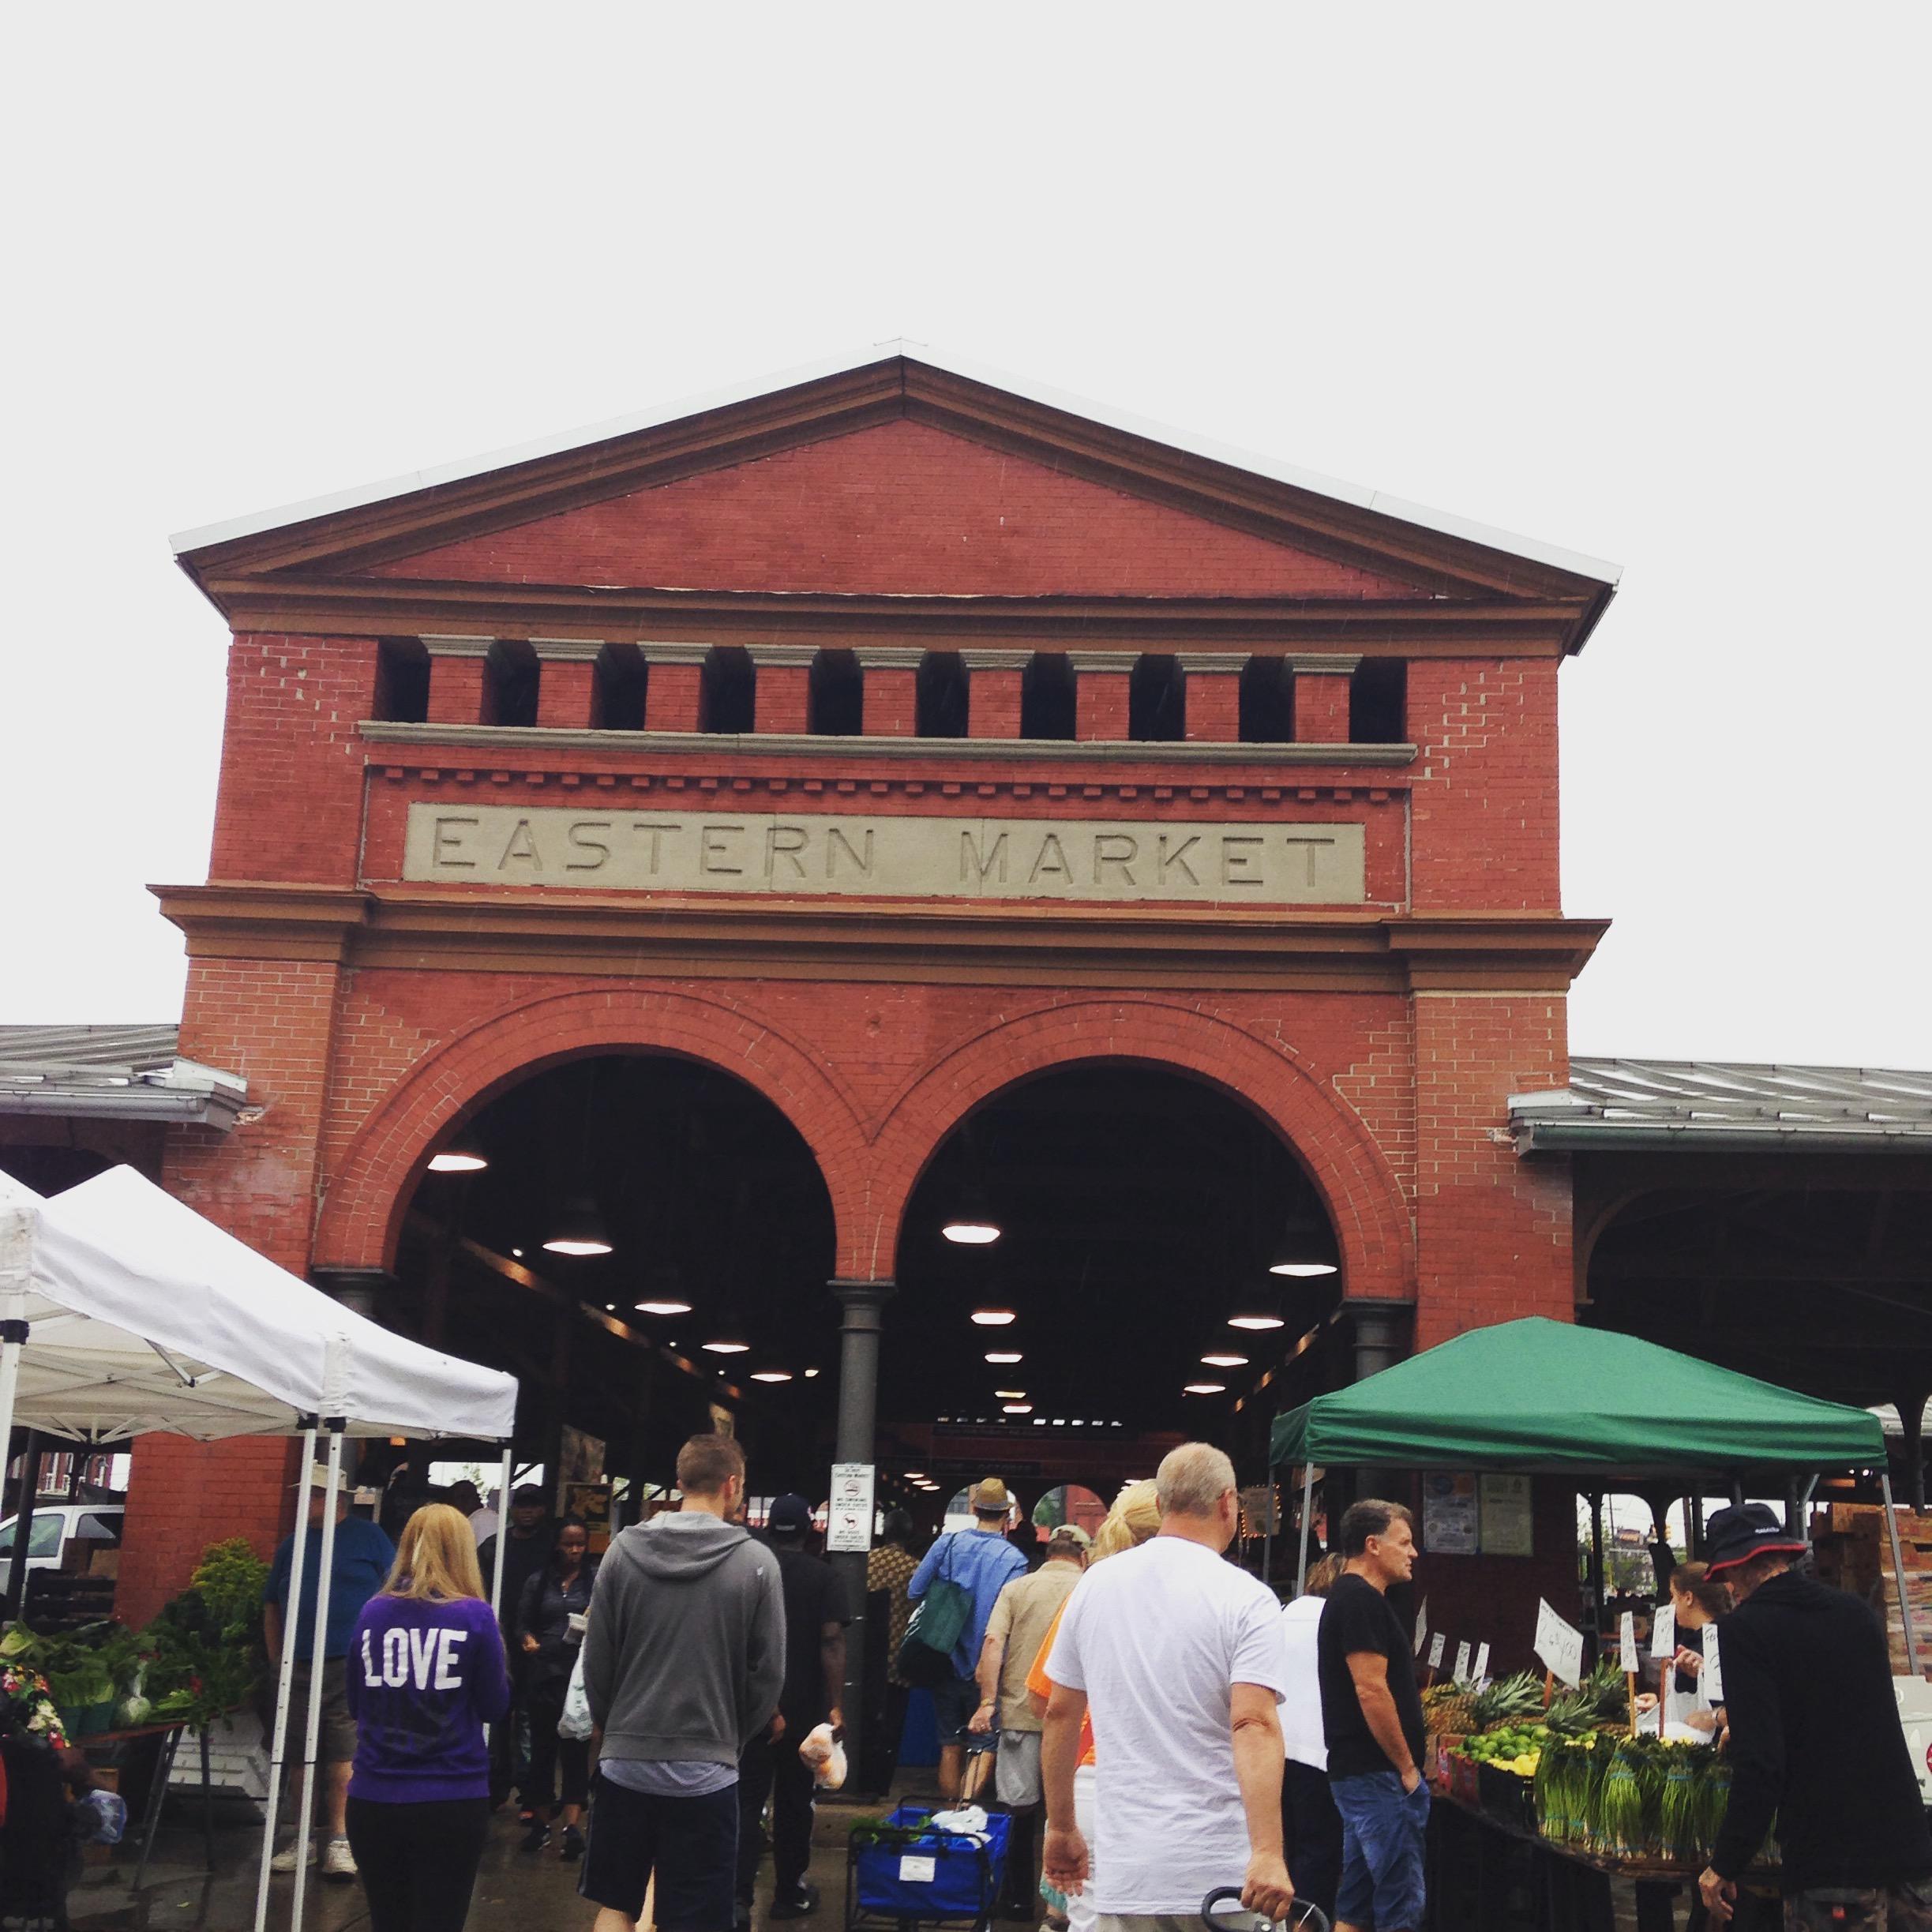 Eastern Market entrance